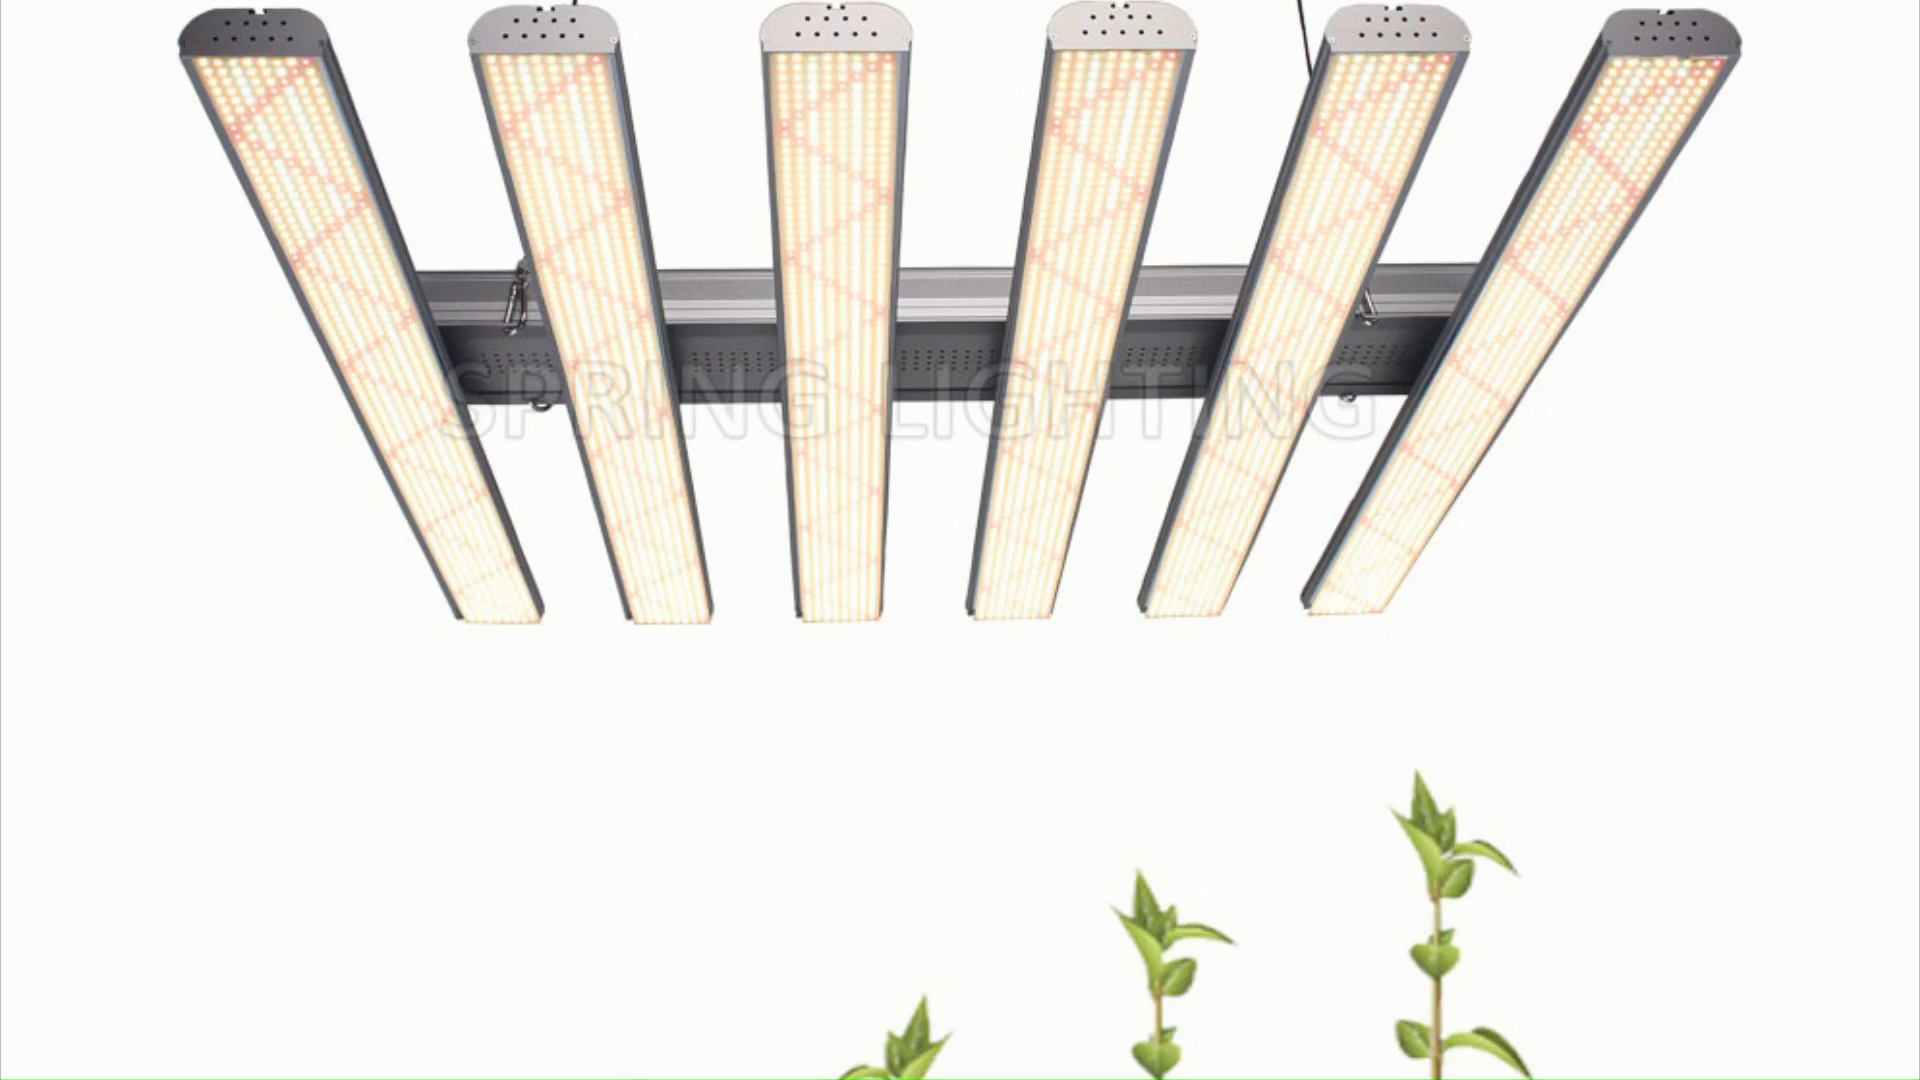 Vertical Farming LED Lighting 600W LED Grow Light Bars with Broad Spectrum 3000K 6500K 660nm